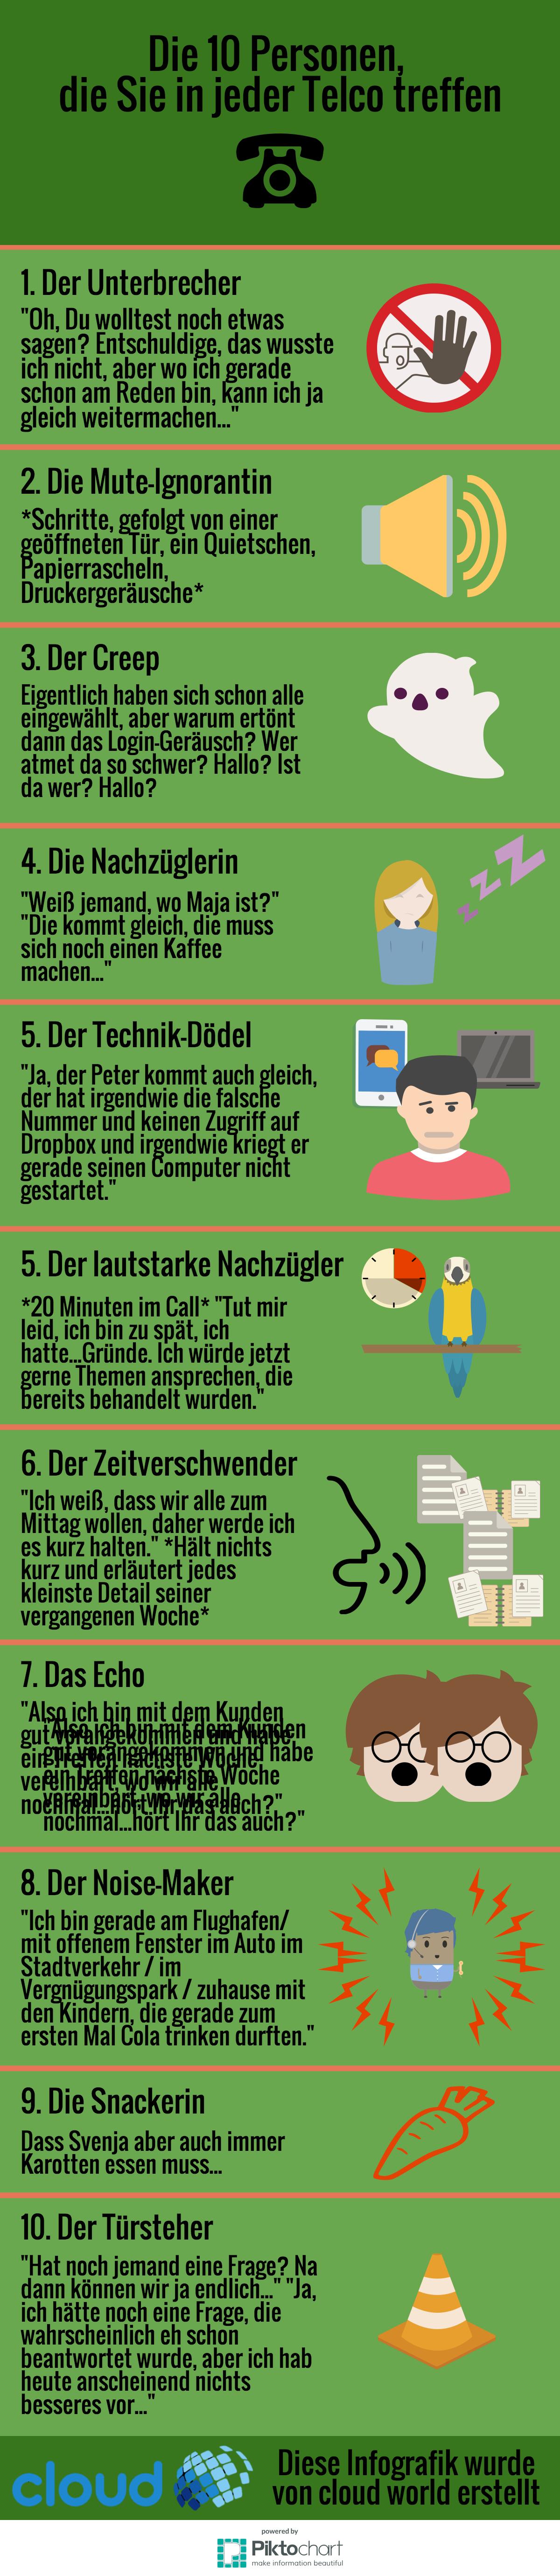 10_Telefon_Konferenz_Typen